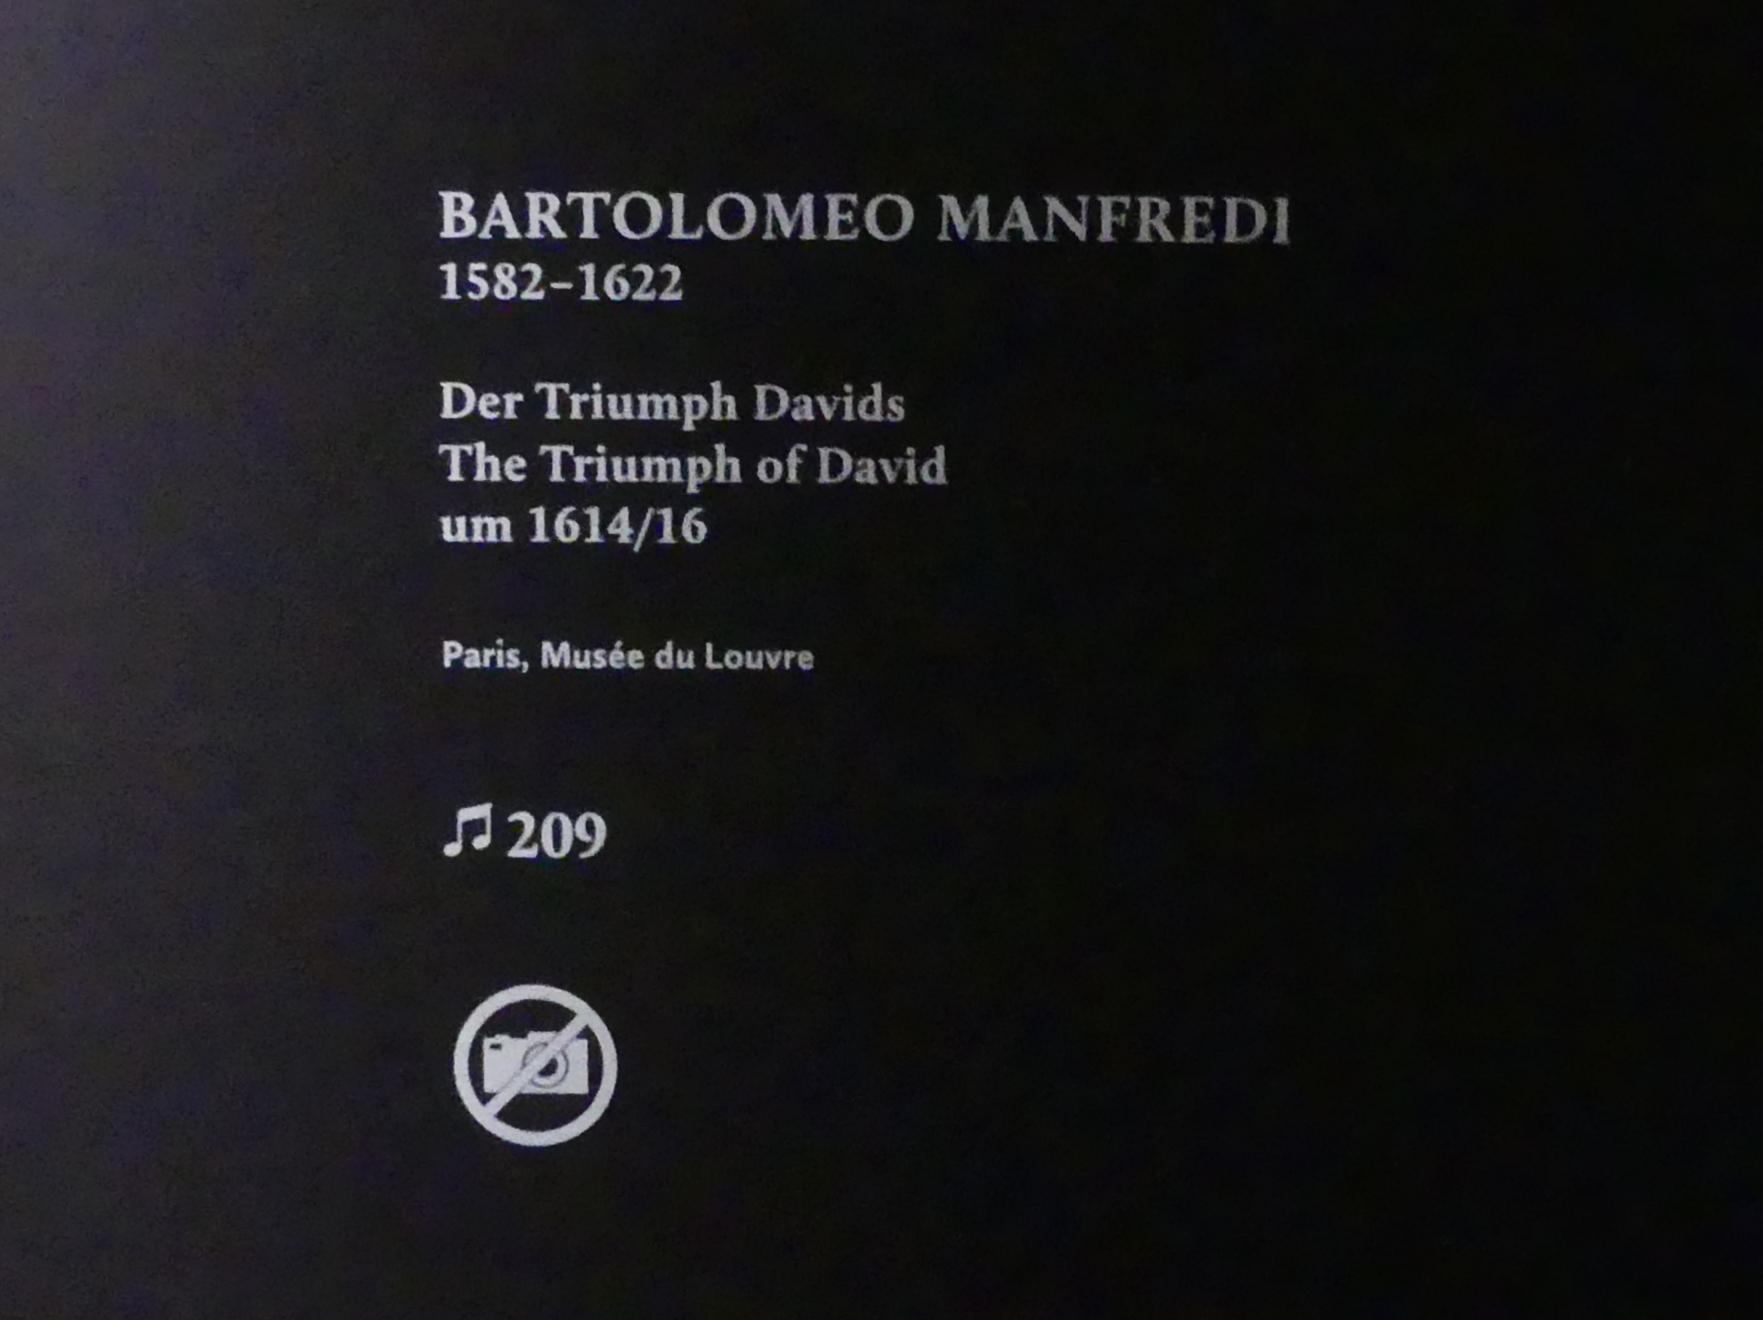 Bartolomeo Manfredi: Der Triumph Davids, um 1614 - 1616